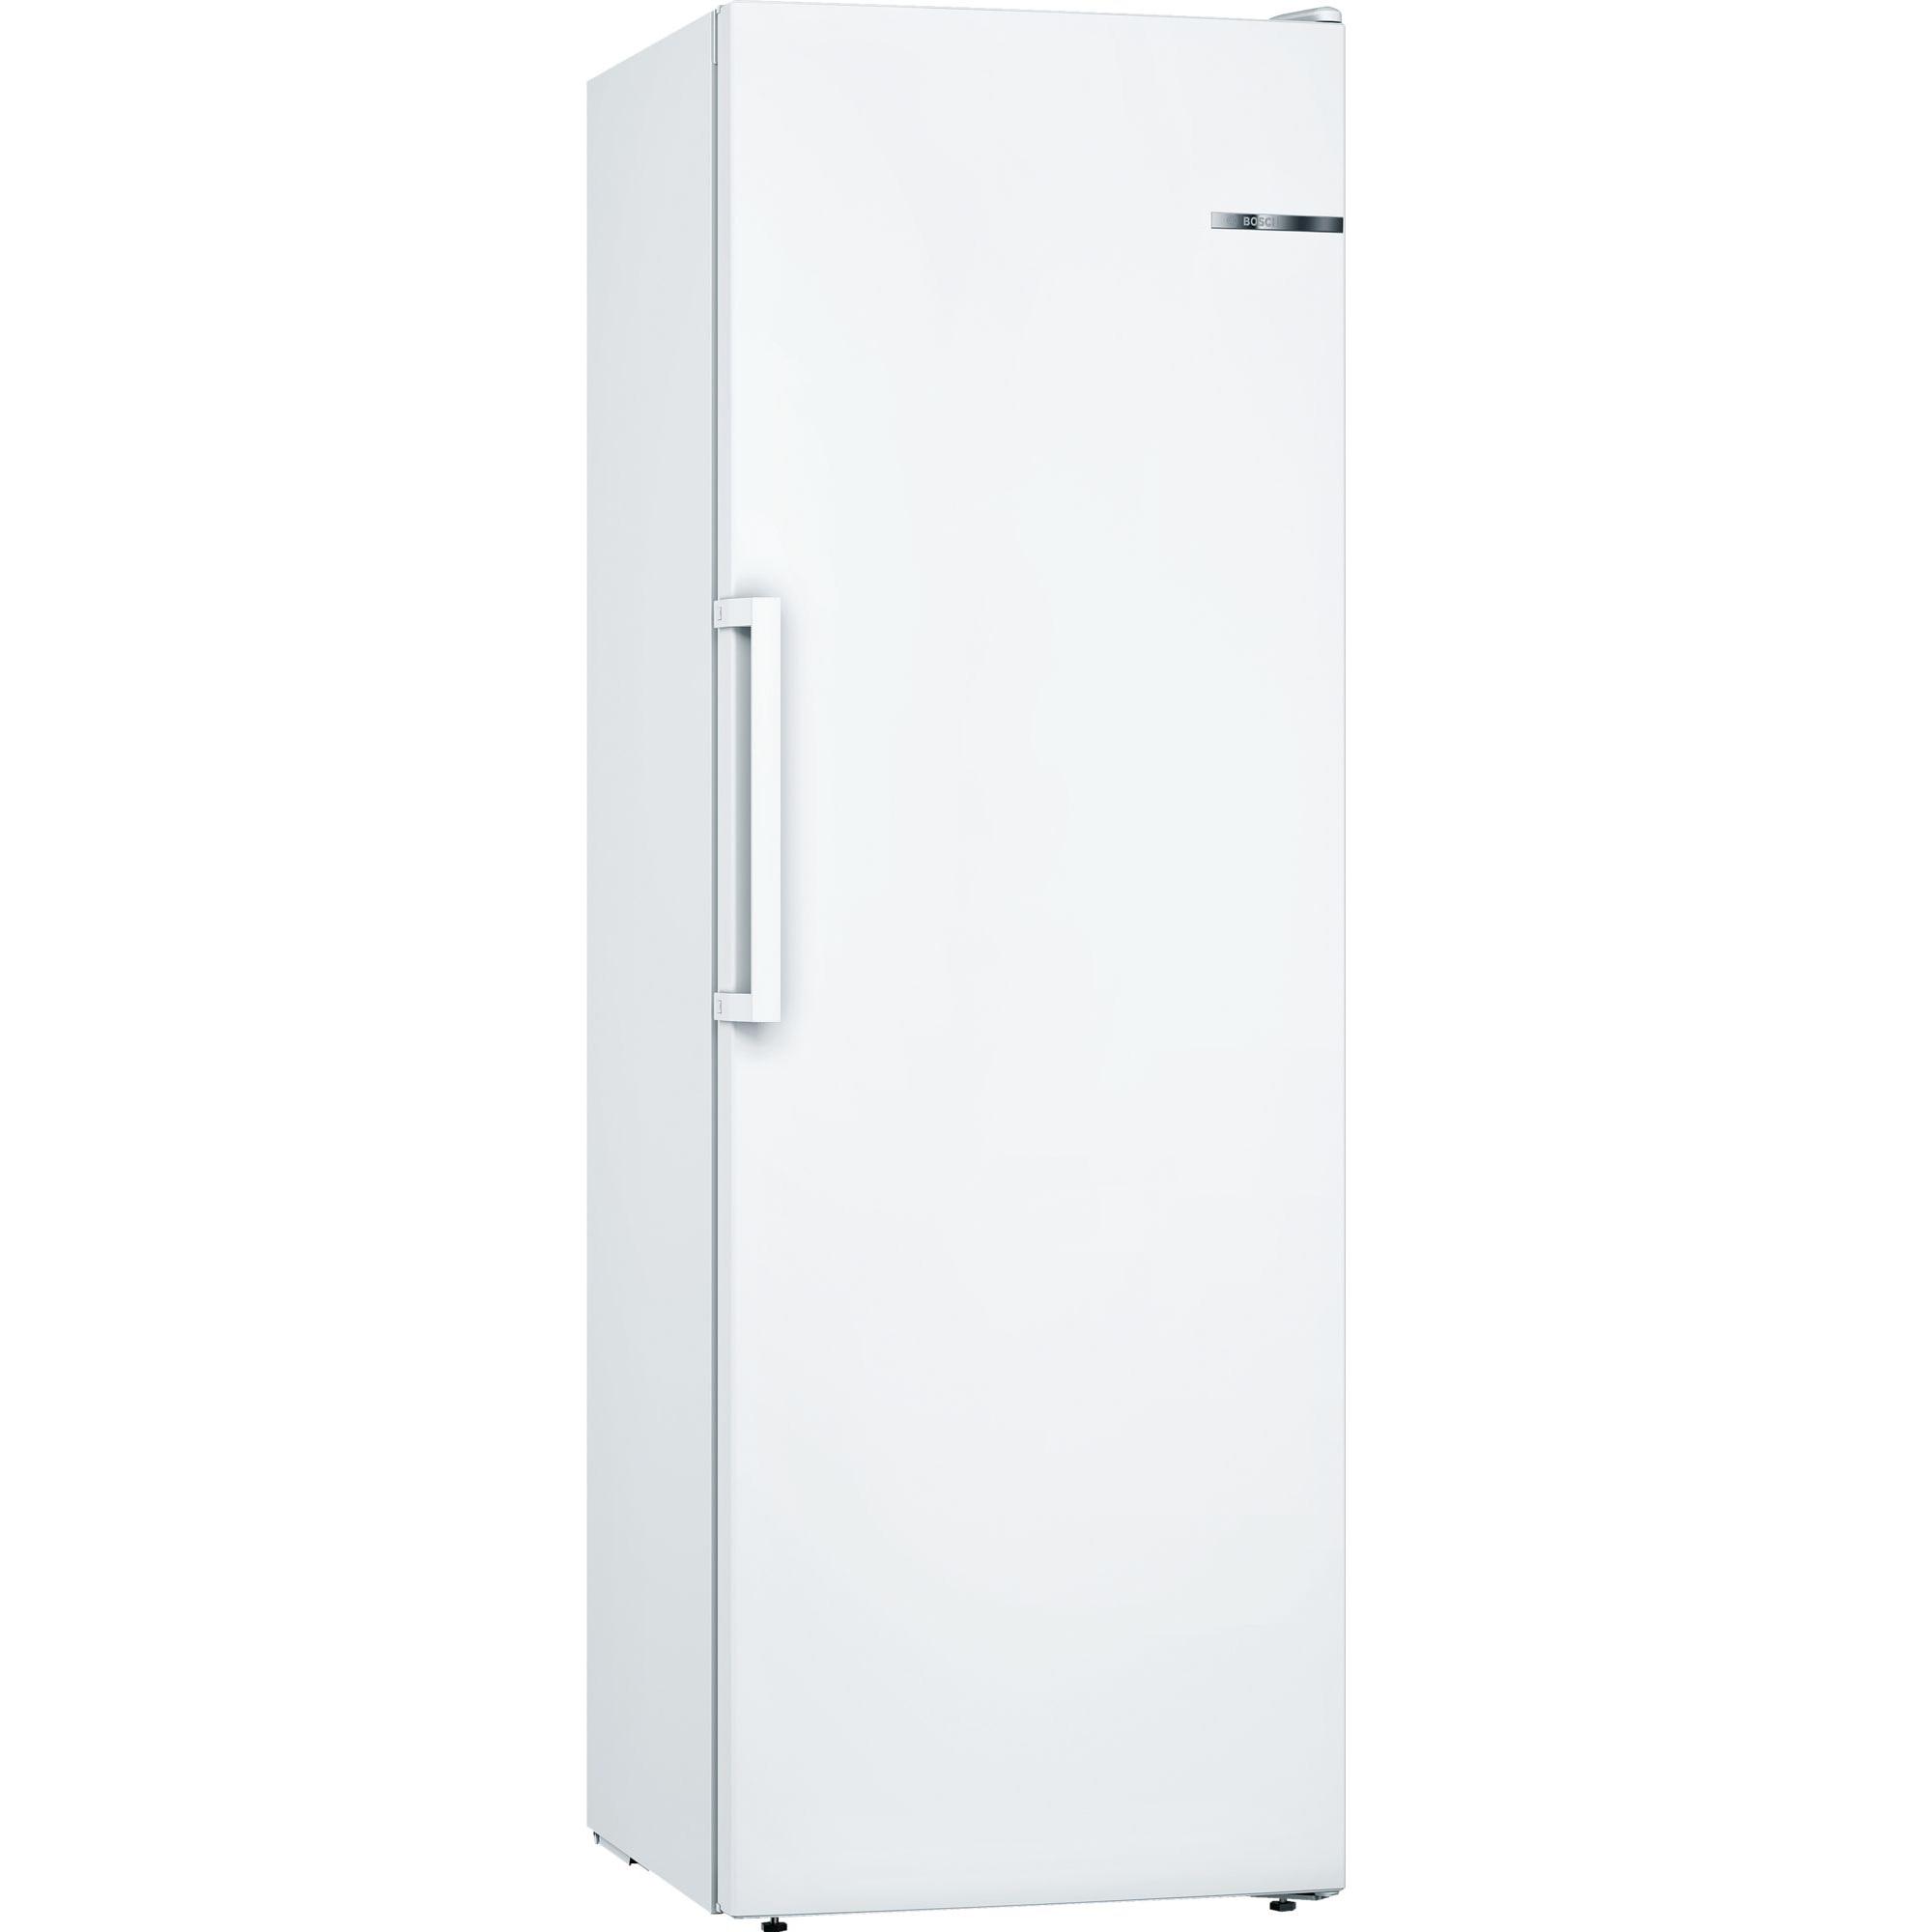 Fotografie Congelator Bosch GSN33VW3P, 225 l, 4 sertare, Clasa A++, No Frost, H 176 cm, Alb